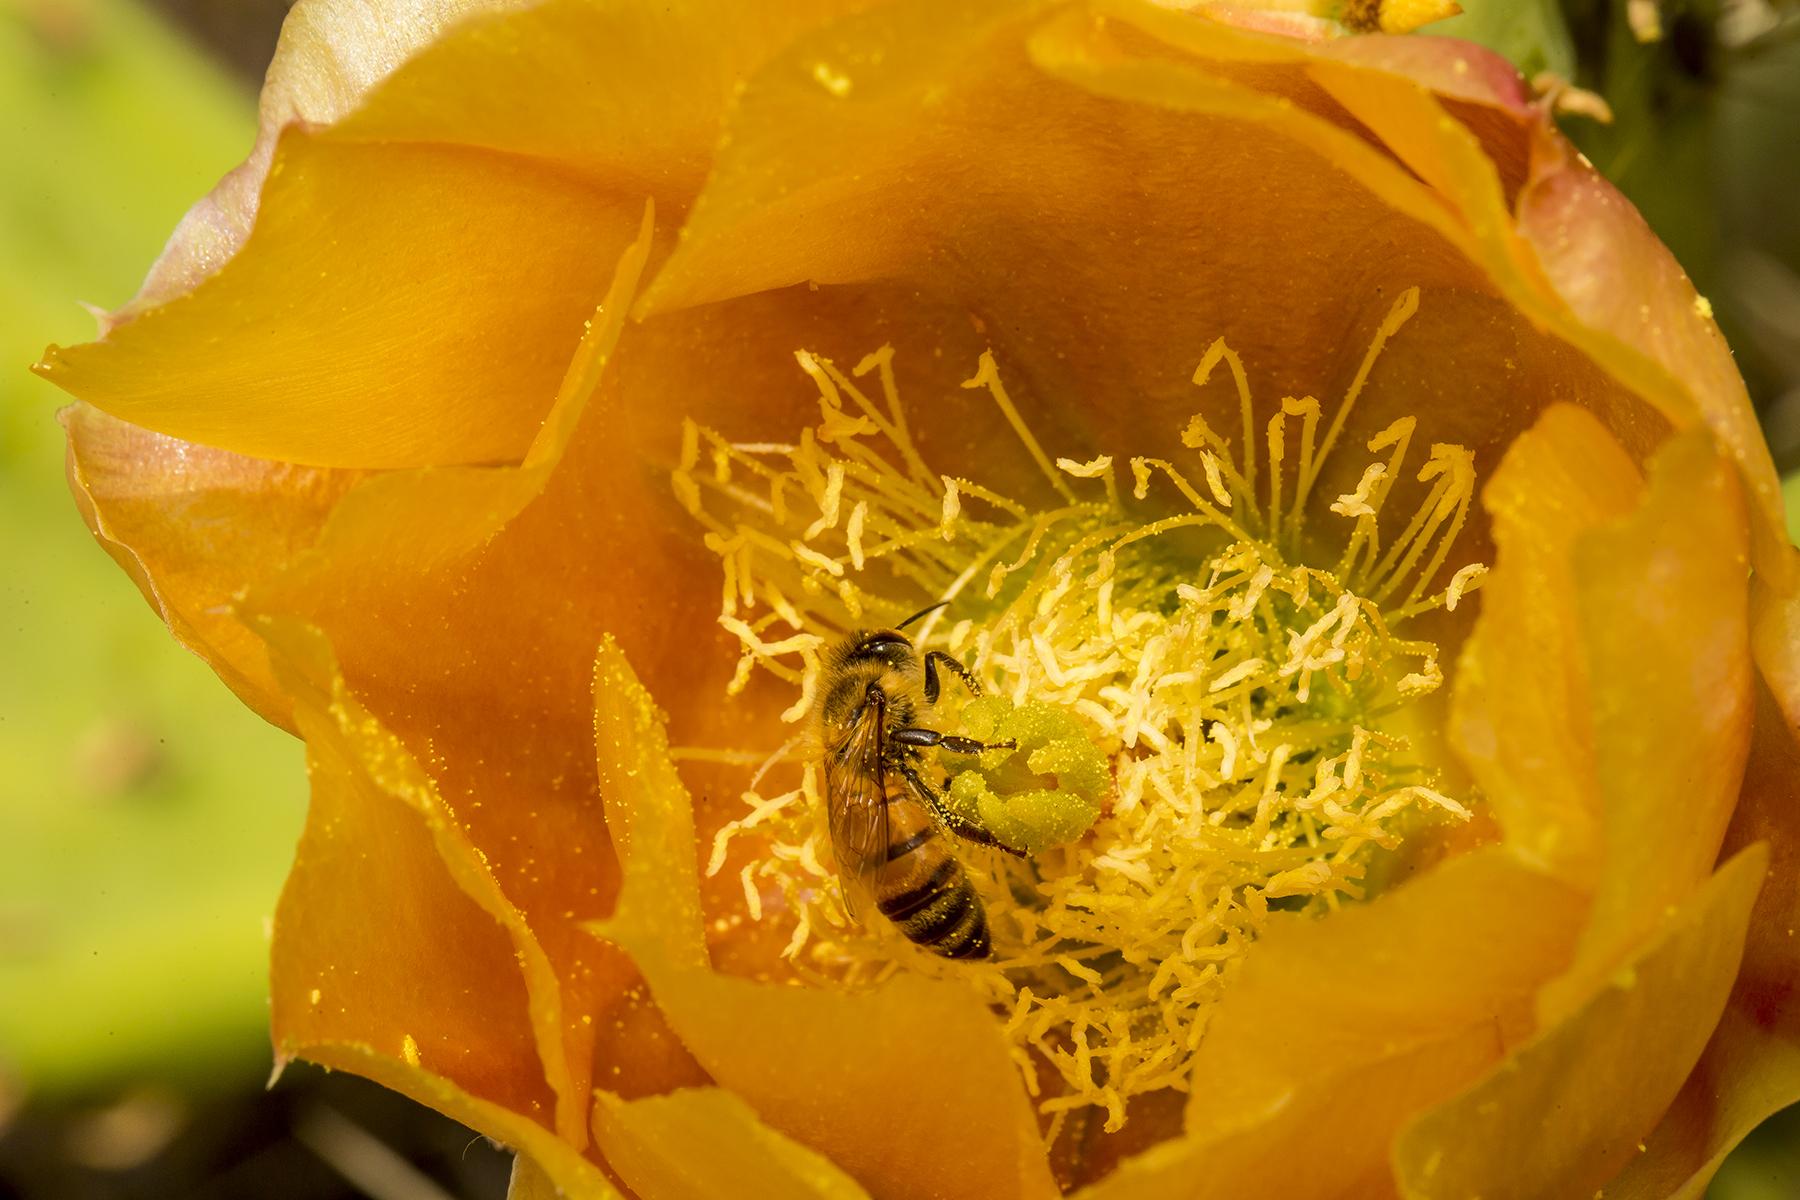 Cactus flower polinator